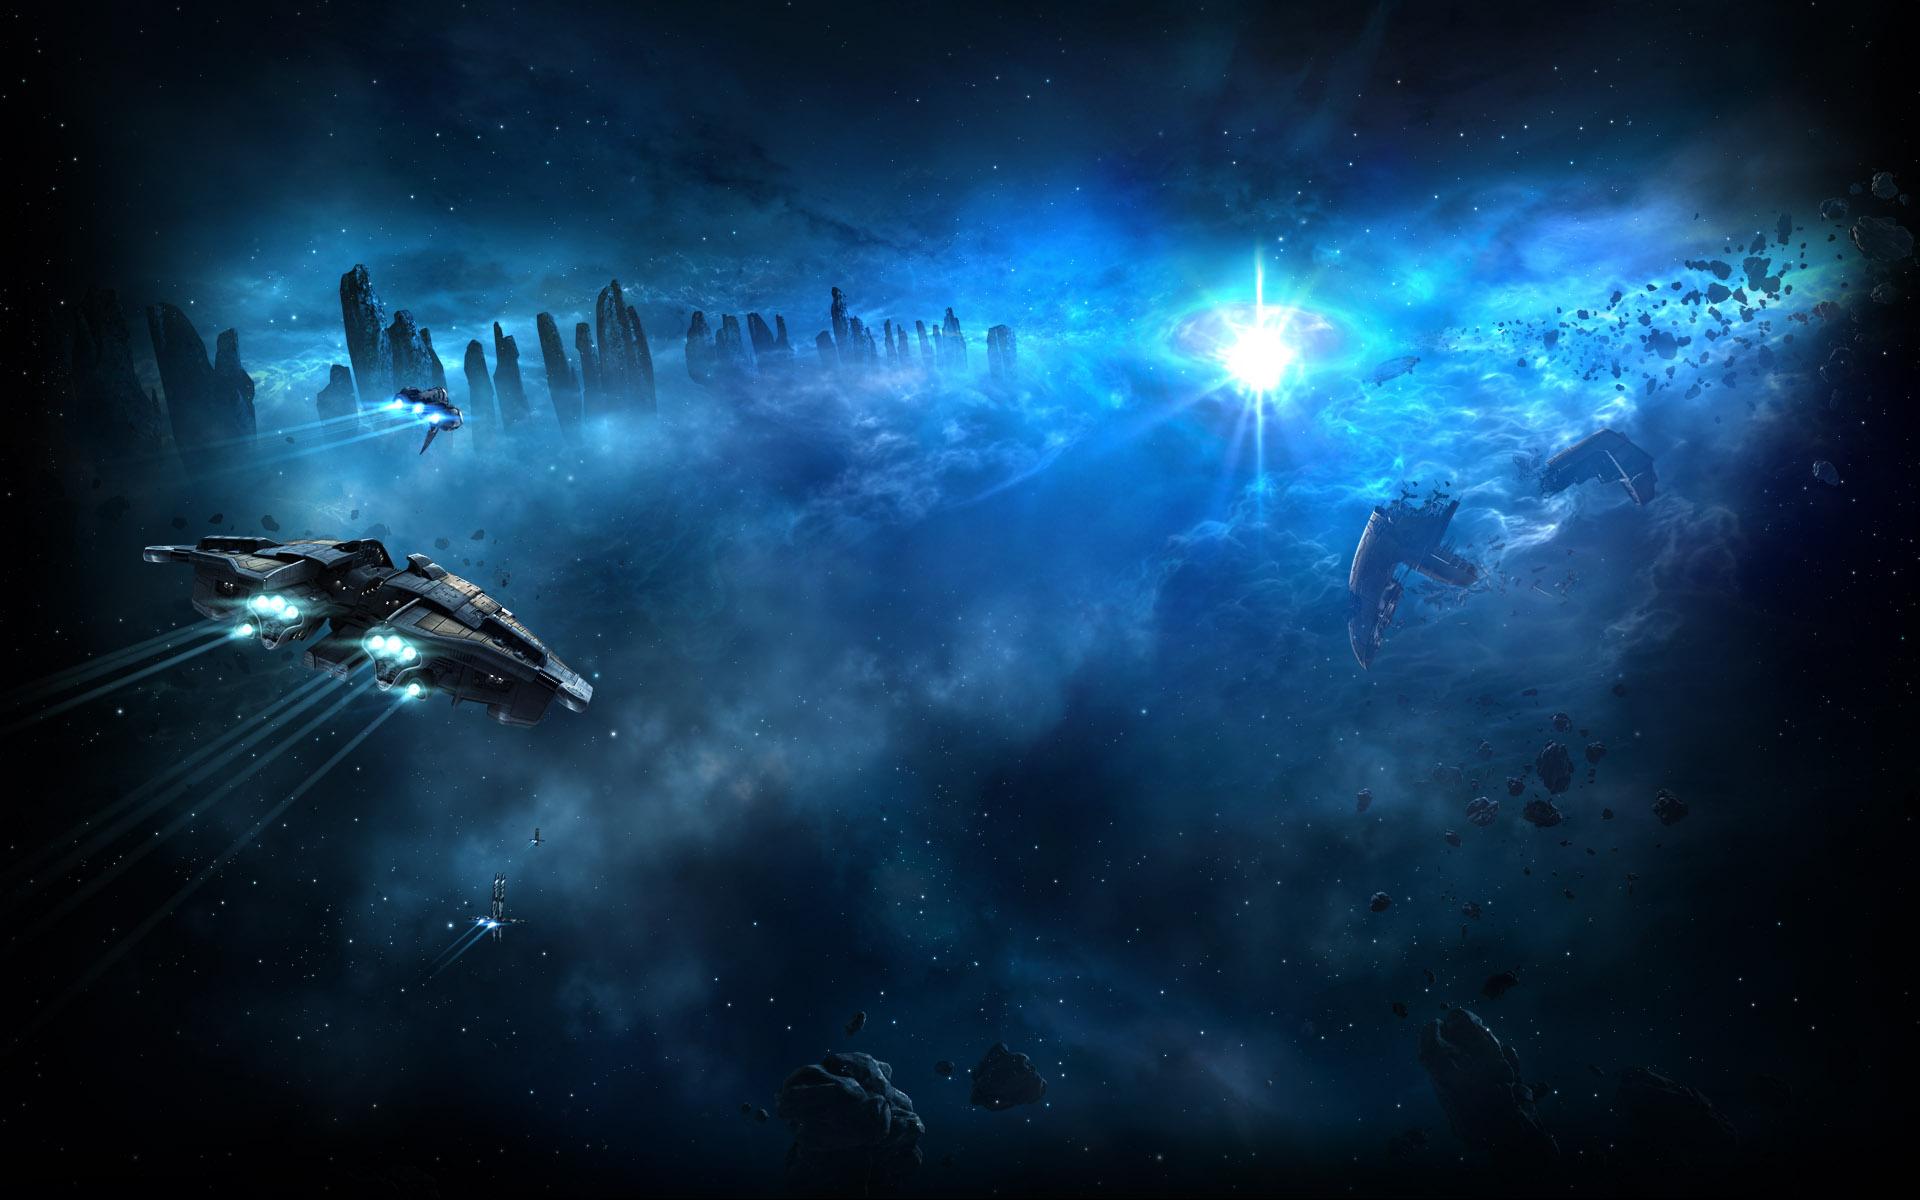 Best Space Galaxy Background Textures Design